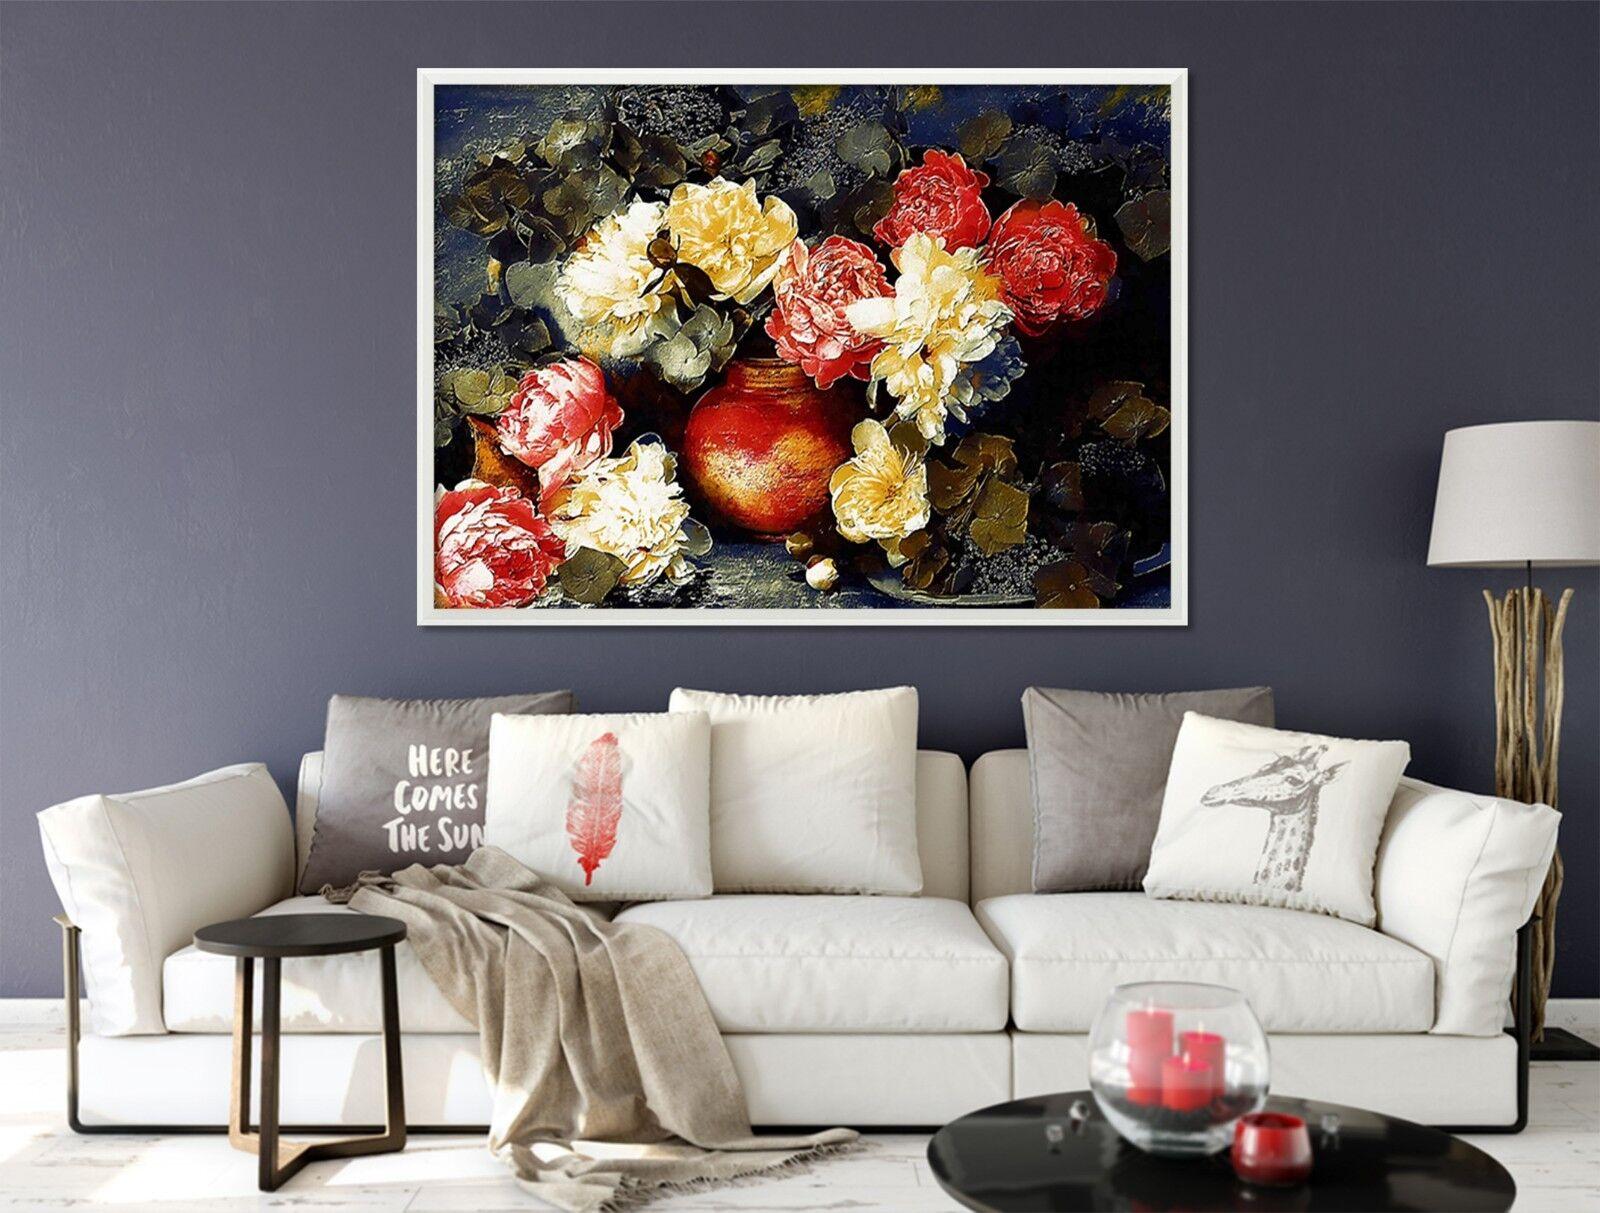 3D Flor Florero 2 Póster Enmarcado Decoración del Hogar Pintura de Impresión Arte Wallpaper